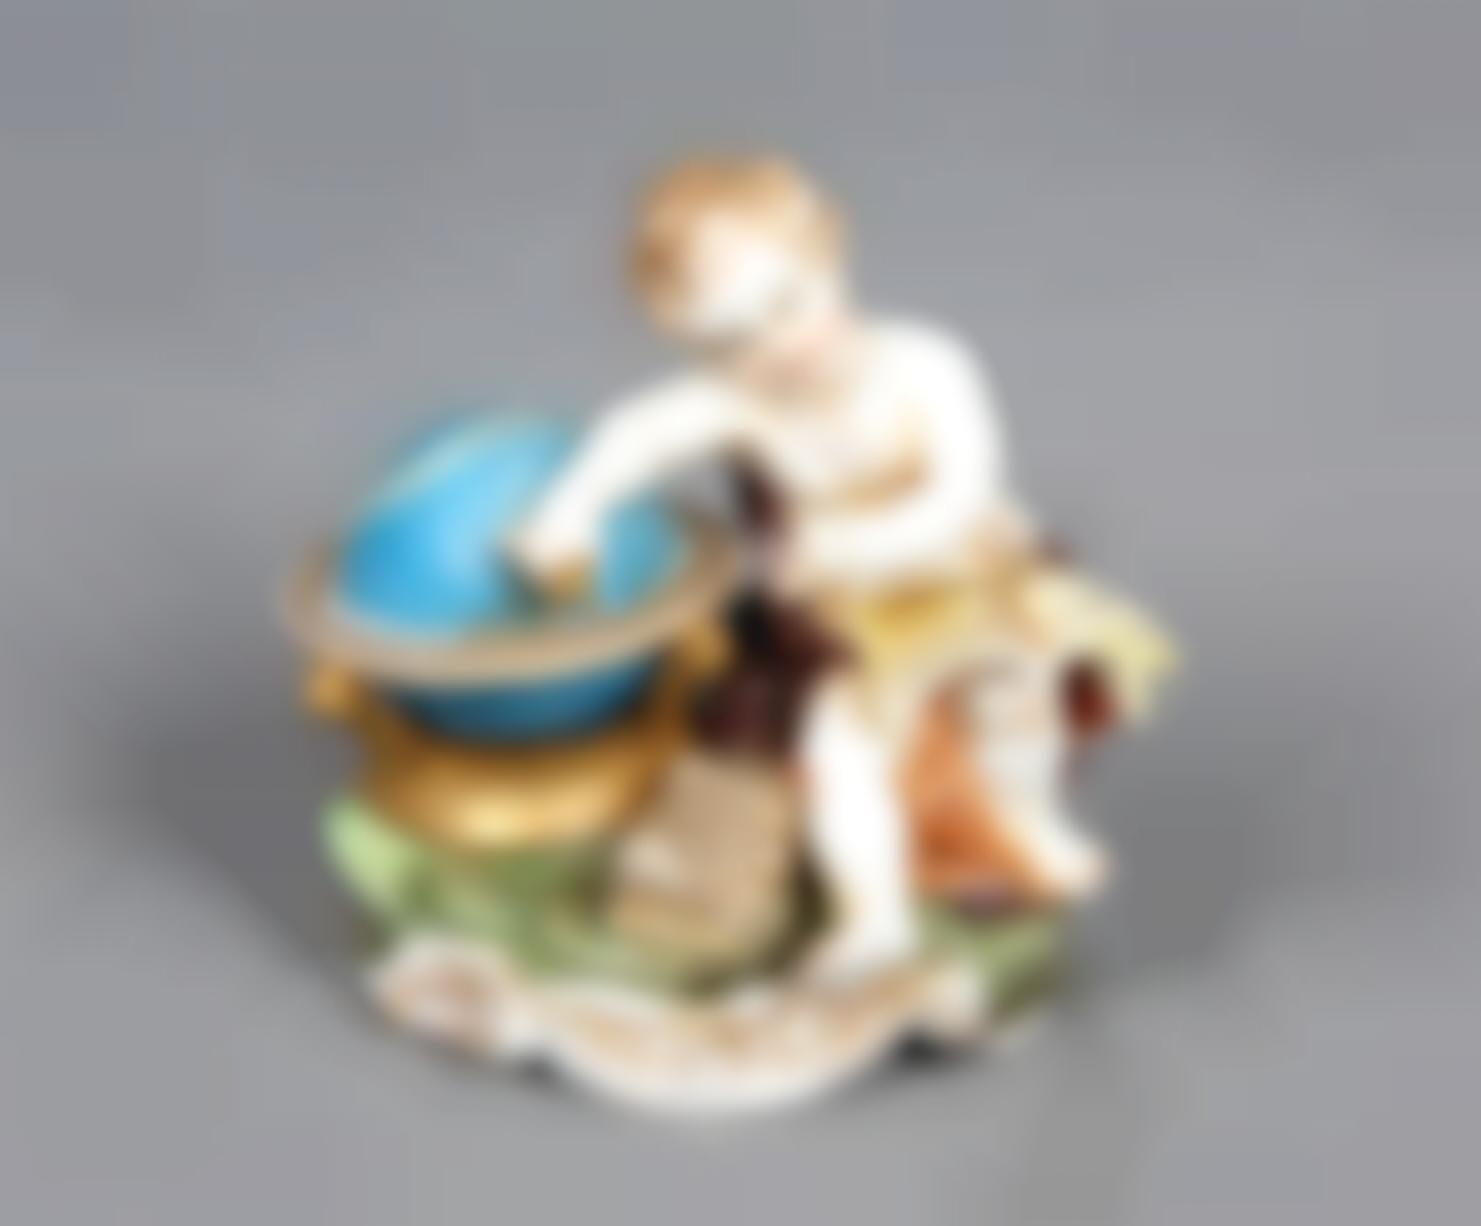 Hispania Spanish Polychrome Porcelain Figure - Angel geographer-